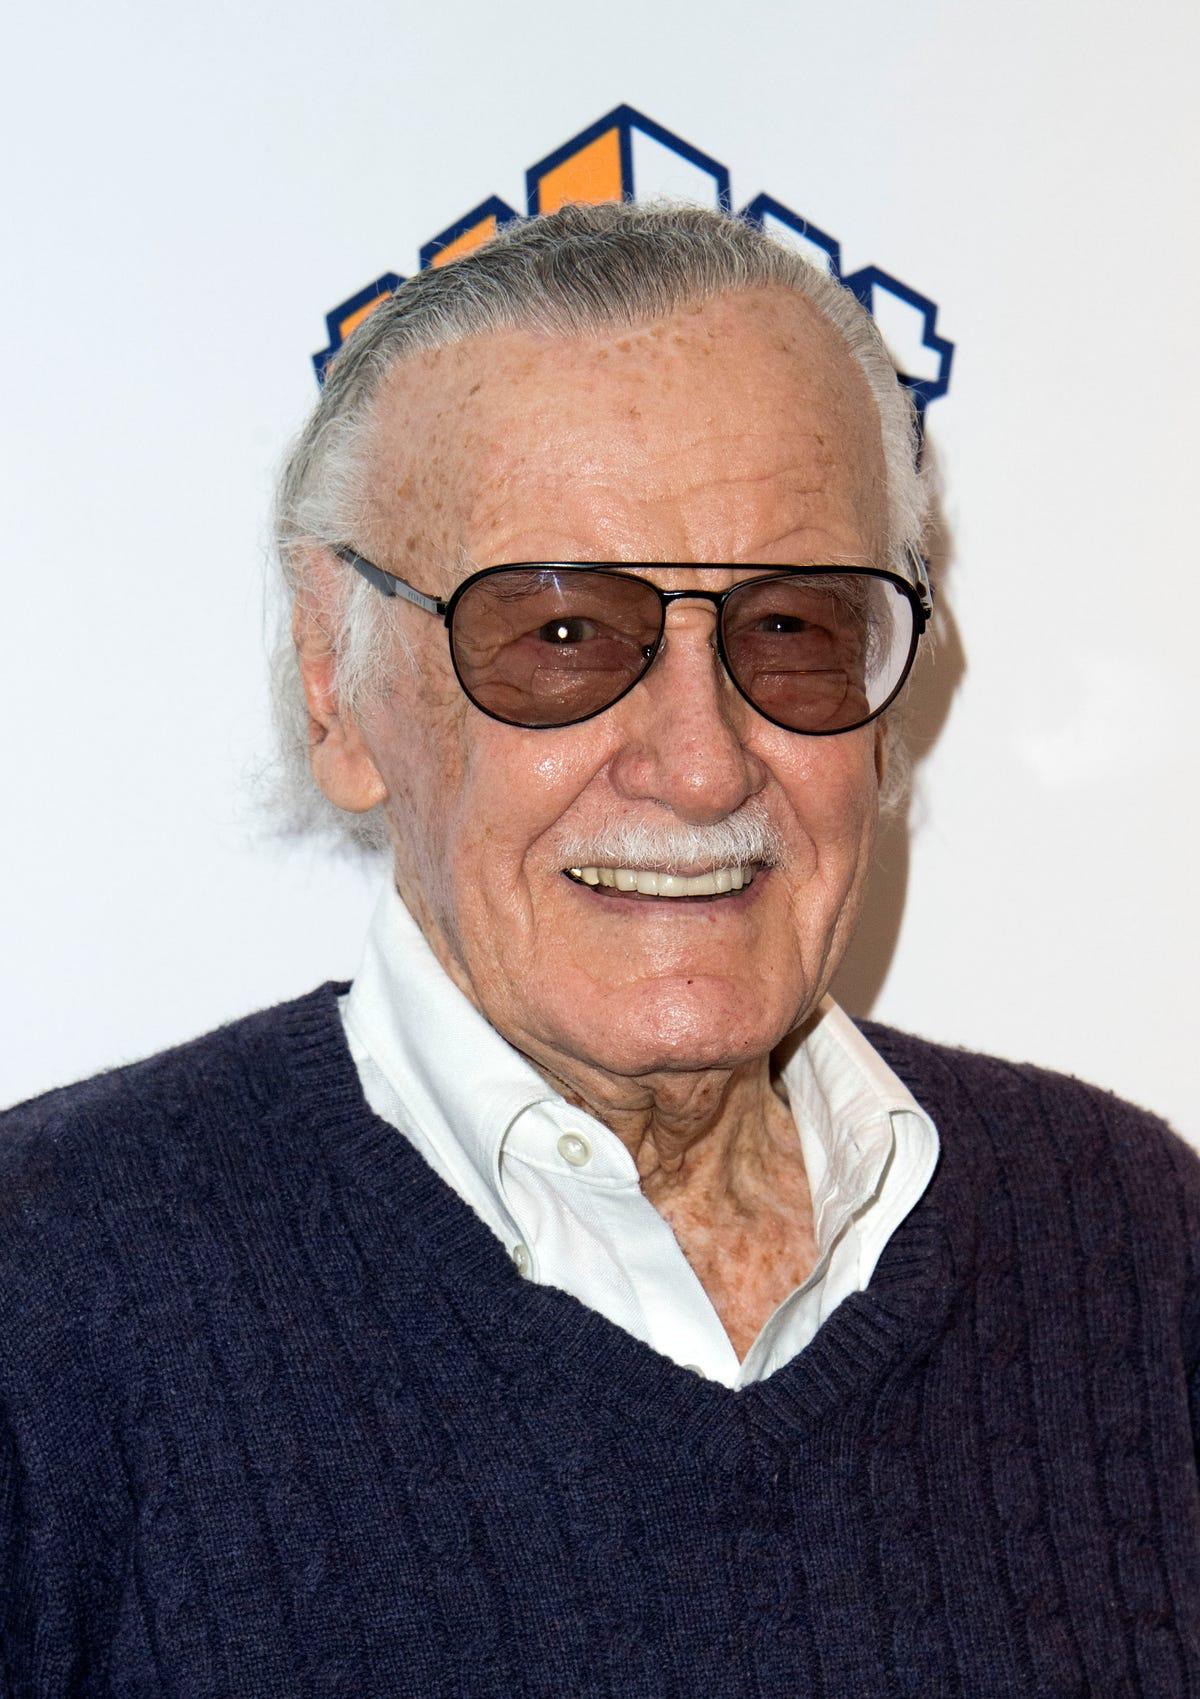 Stan Lee dead: Chris Evans, Marvel superheros react to icon's passing